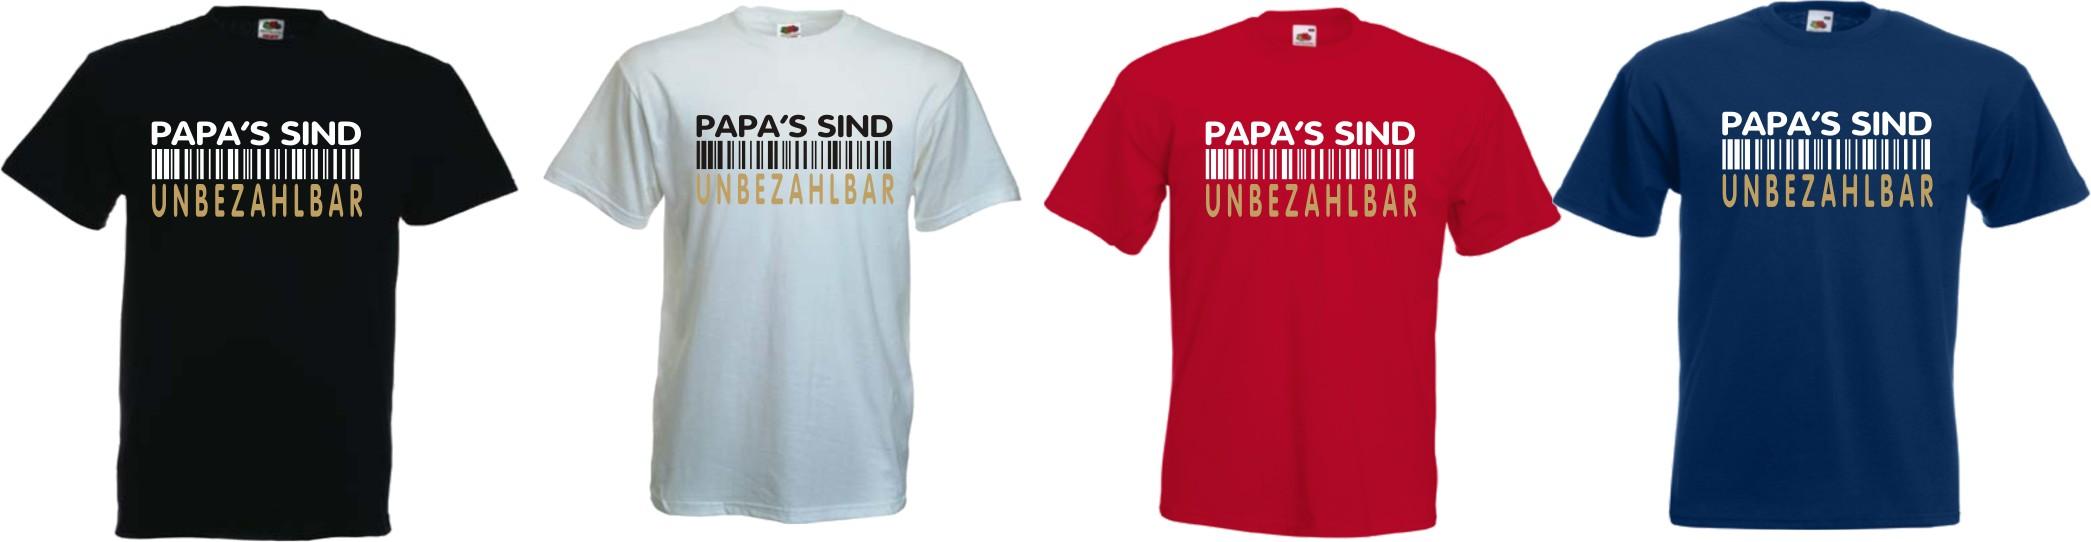 Papa_unbezahlbar_alle_farben.jpg